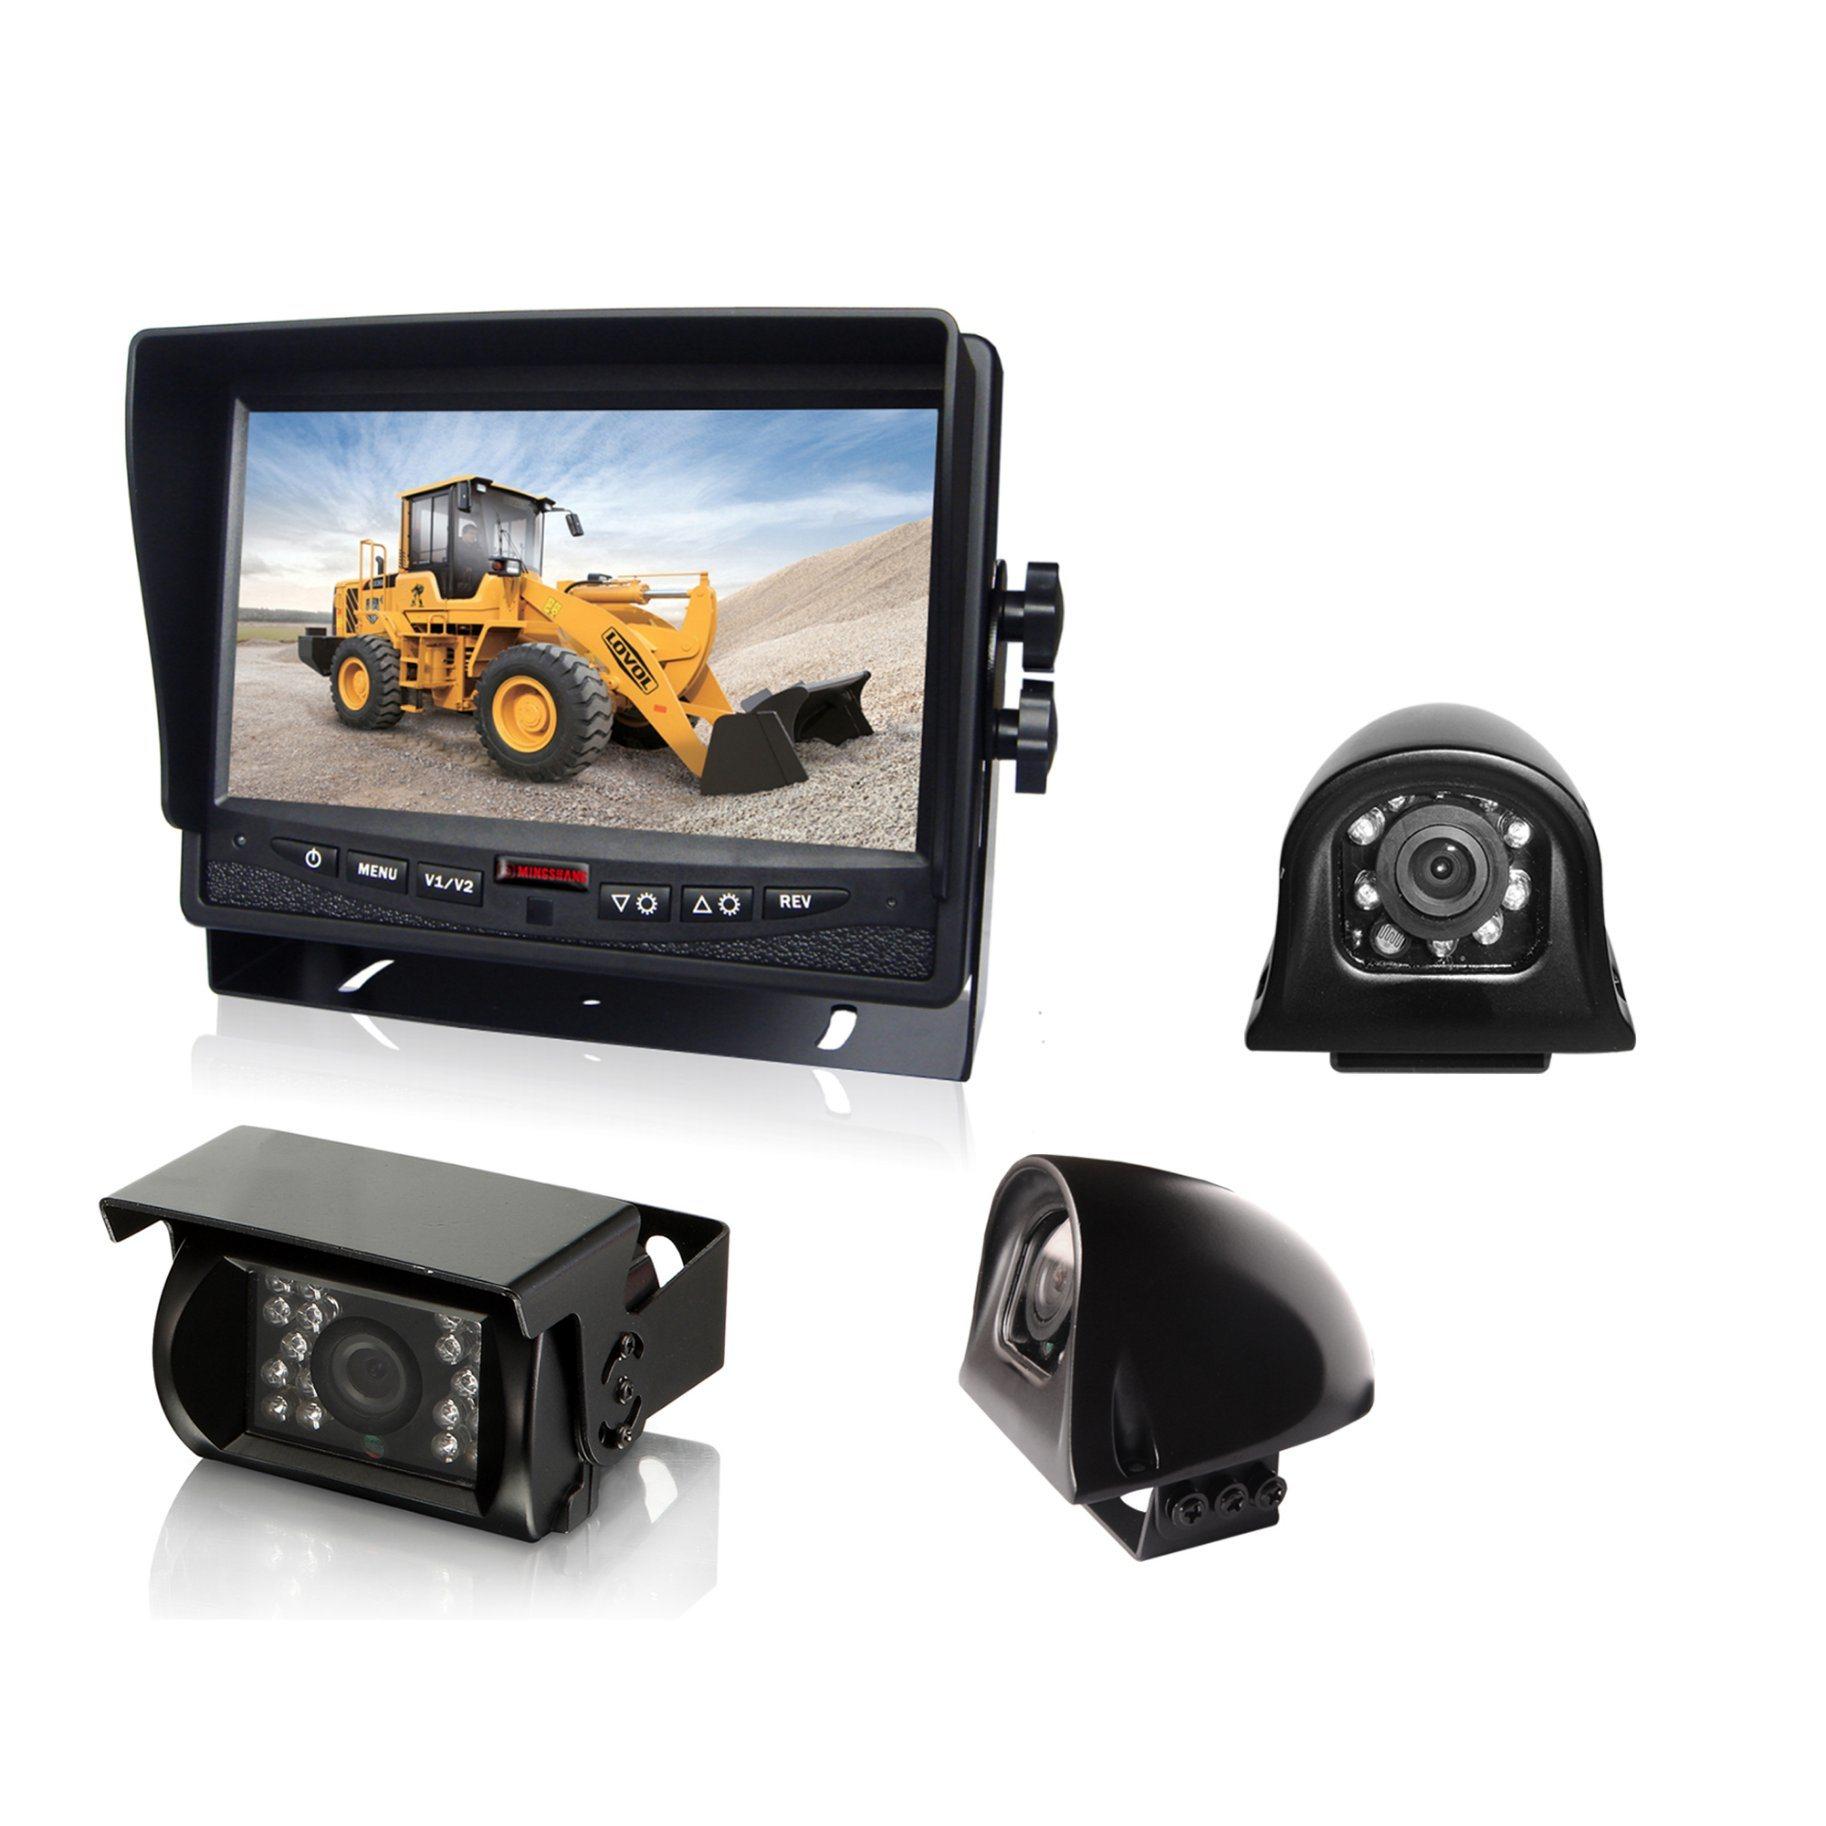 7inch Heavy Duty 24V CCD Bus/Truck Rear View Camera System